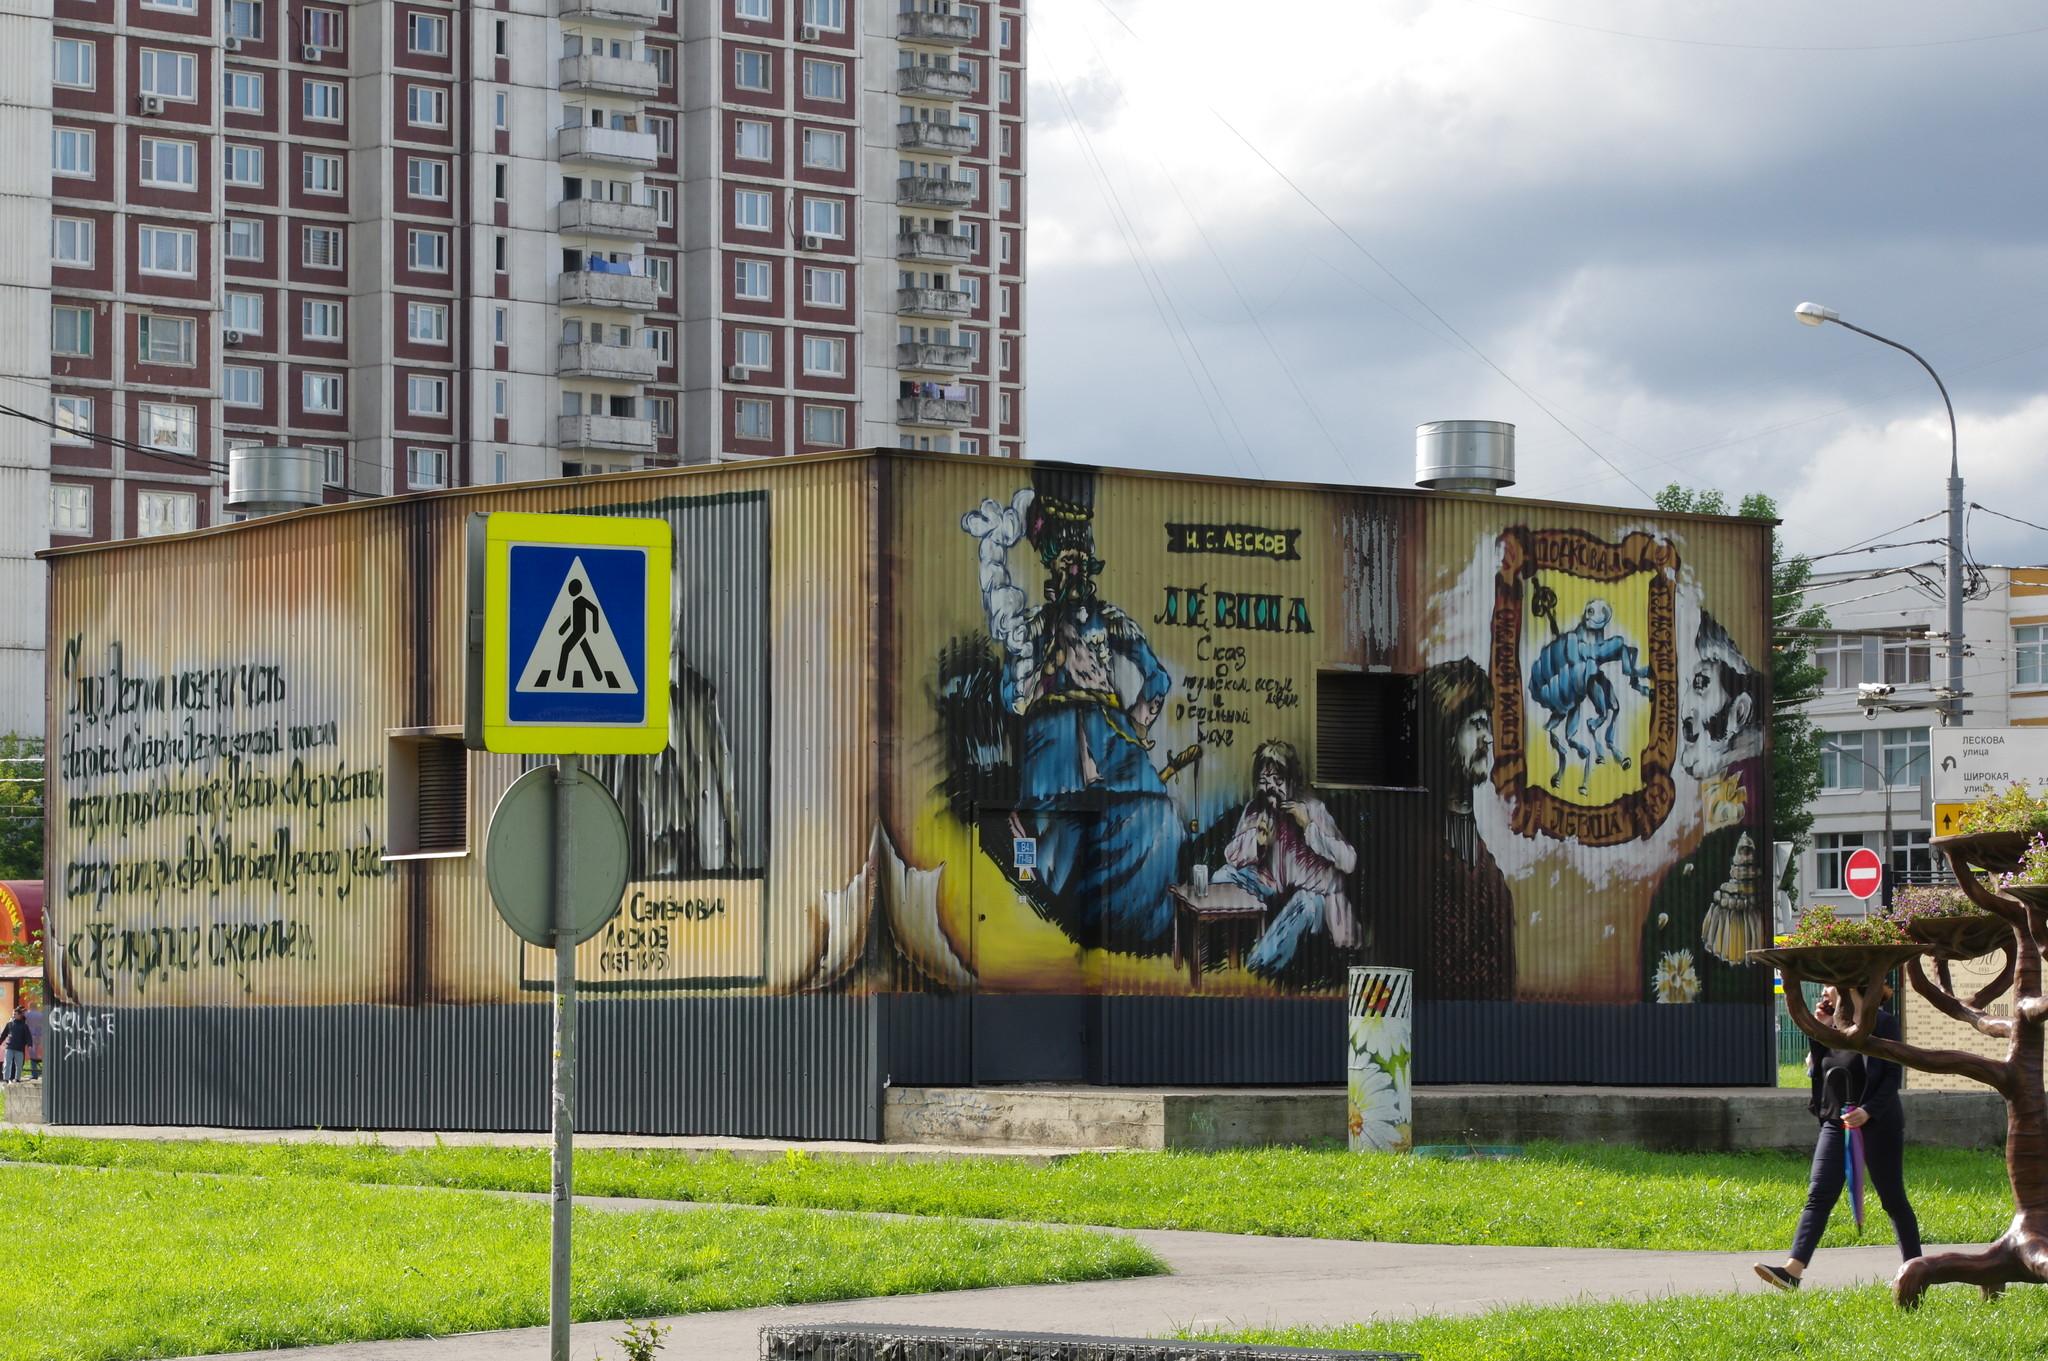 Граффити по произведениям писателя Николая Семёновича Лескова (улица Лескова, 3Б)